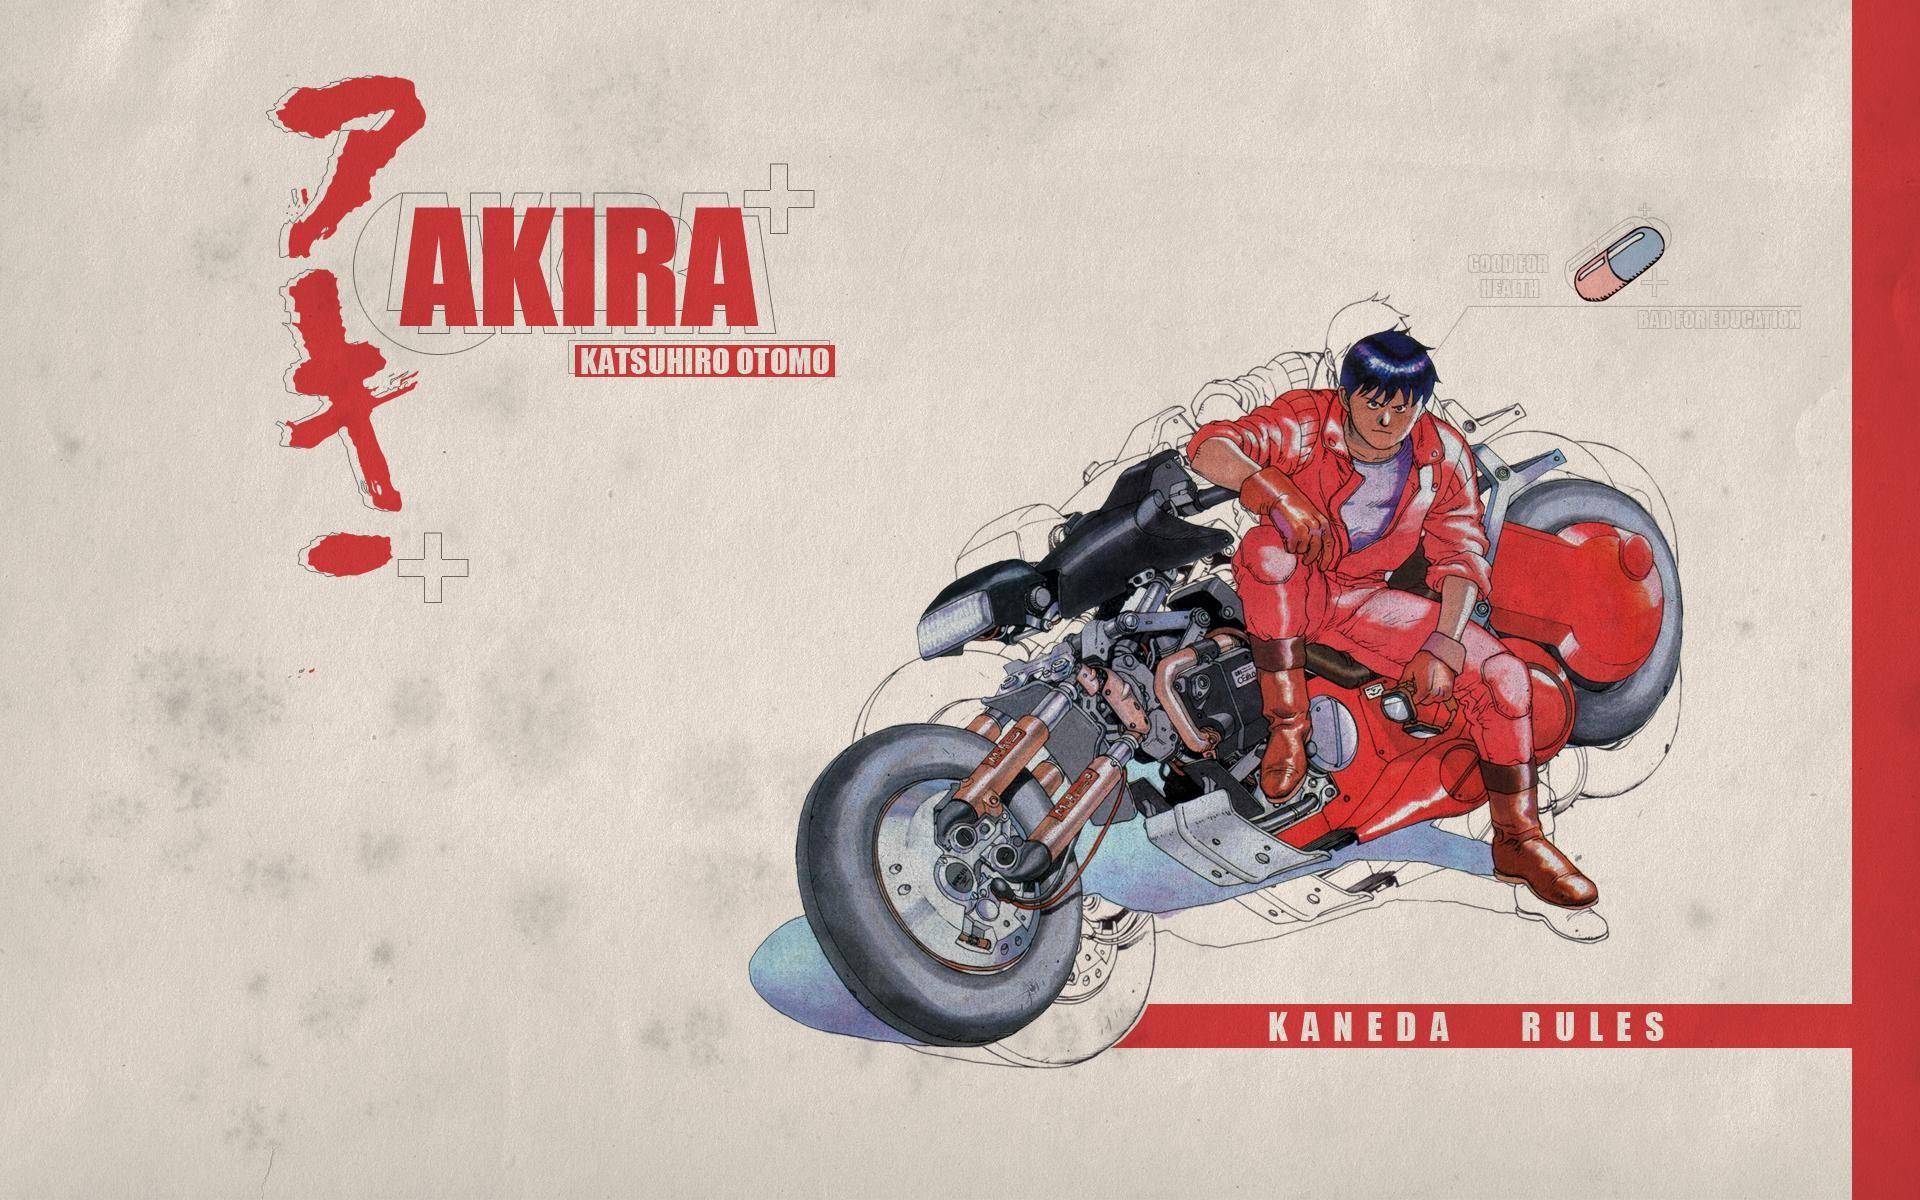 Akira Wallpaper Download Free Hd Wallpapers For Desktop